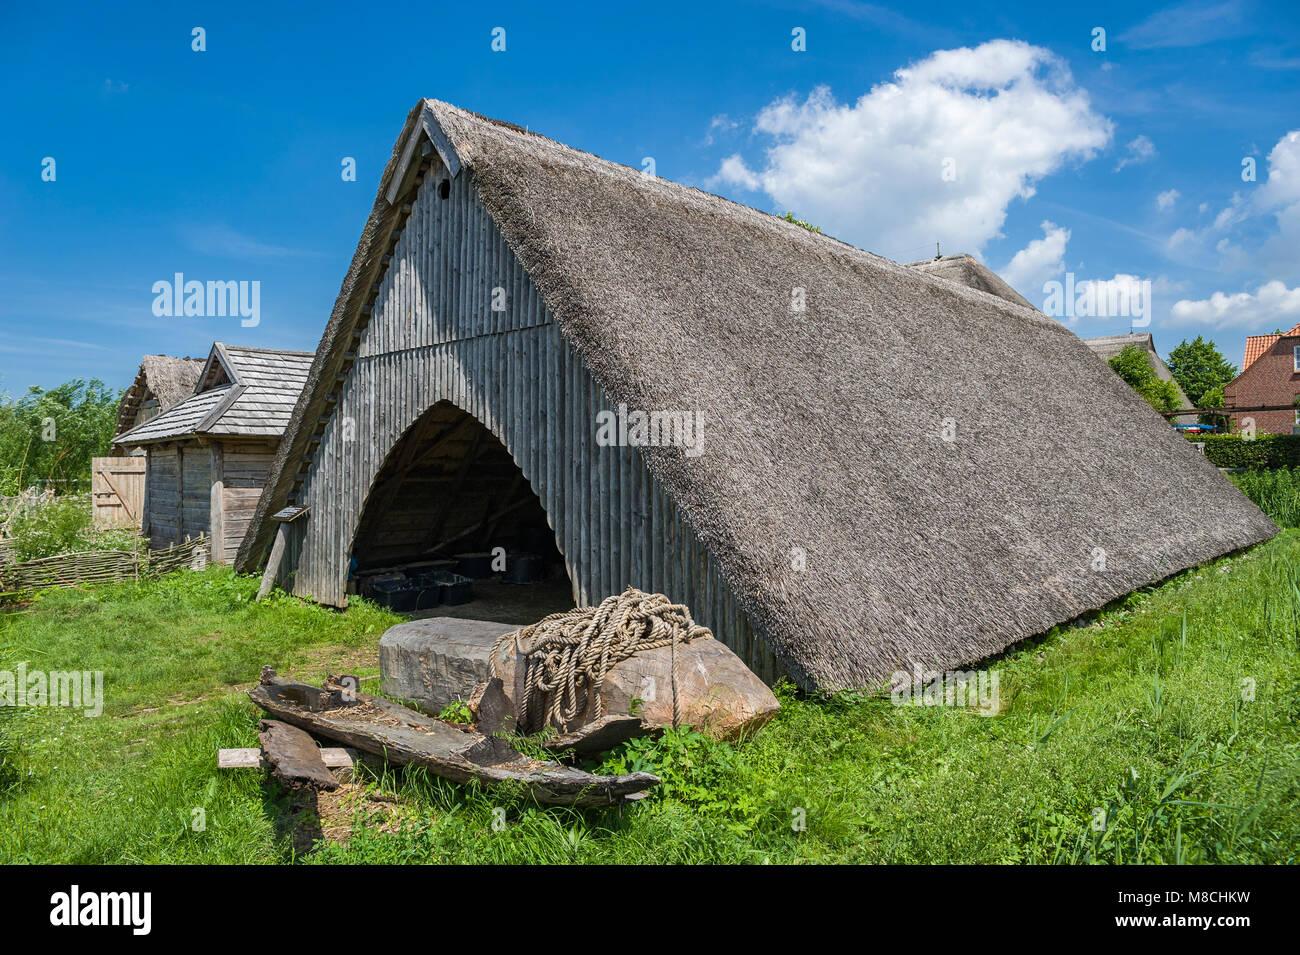 Wallmuseum, slavic village, Oldenburg in Holstein, Baltic Sea, Schleswig-Holstein, Germany, Europe - Stock Image